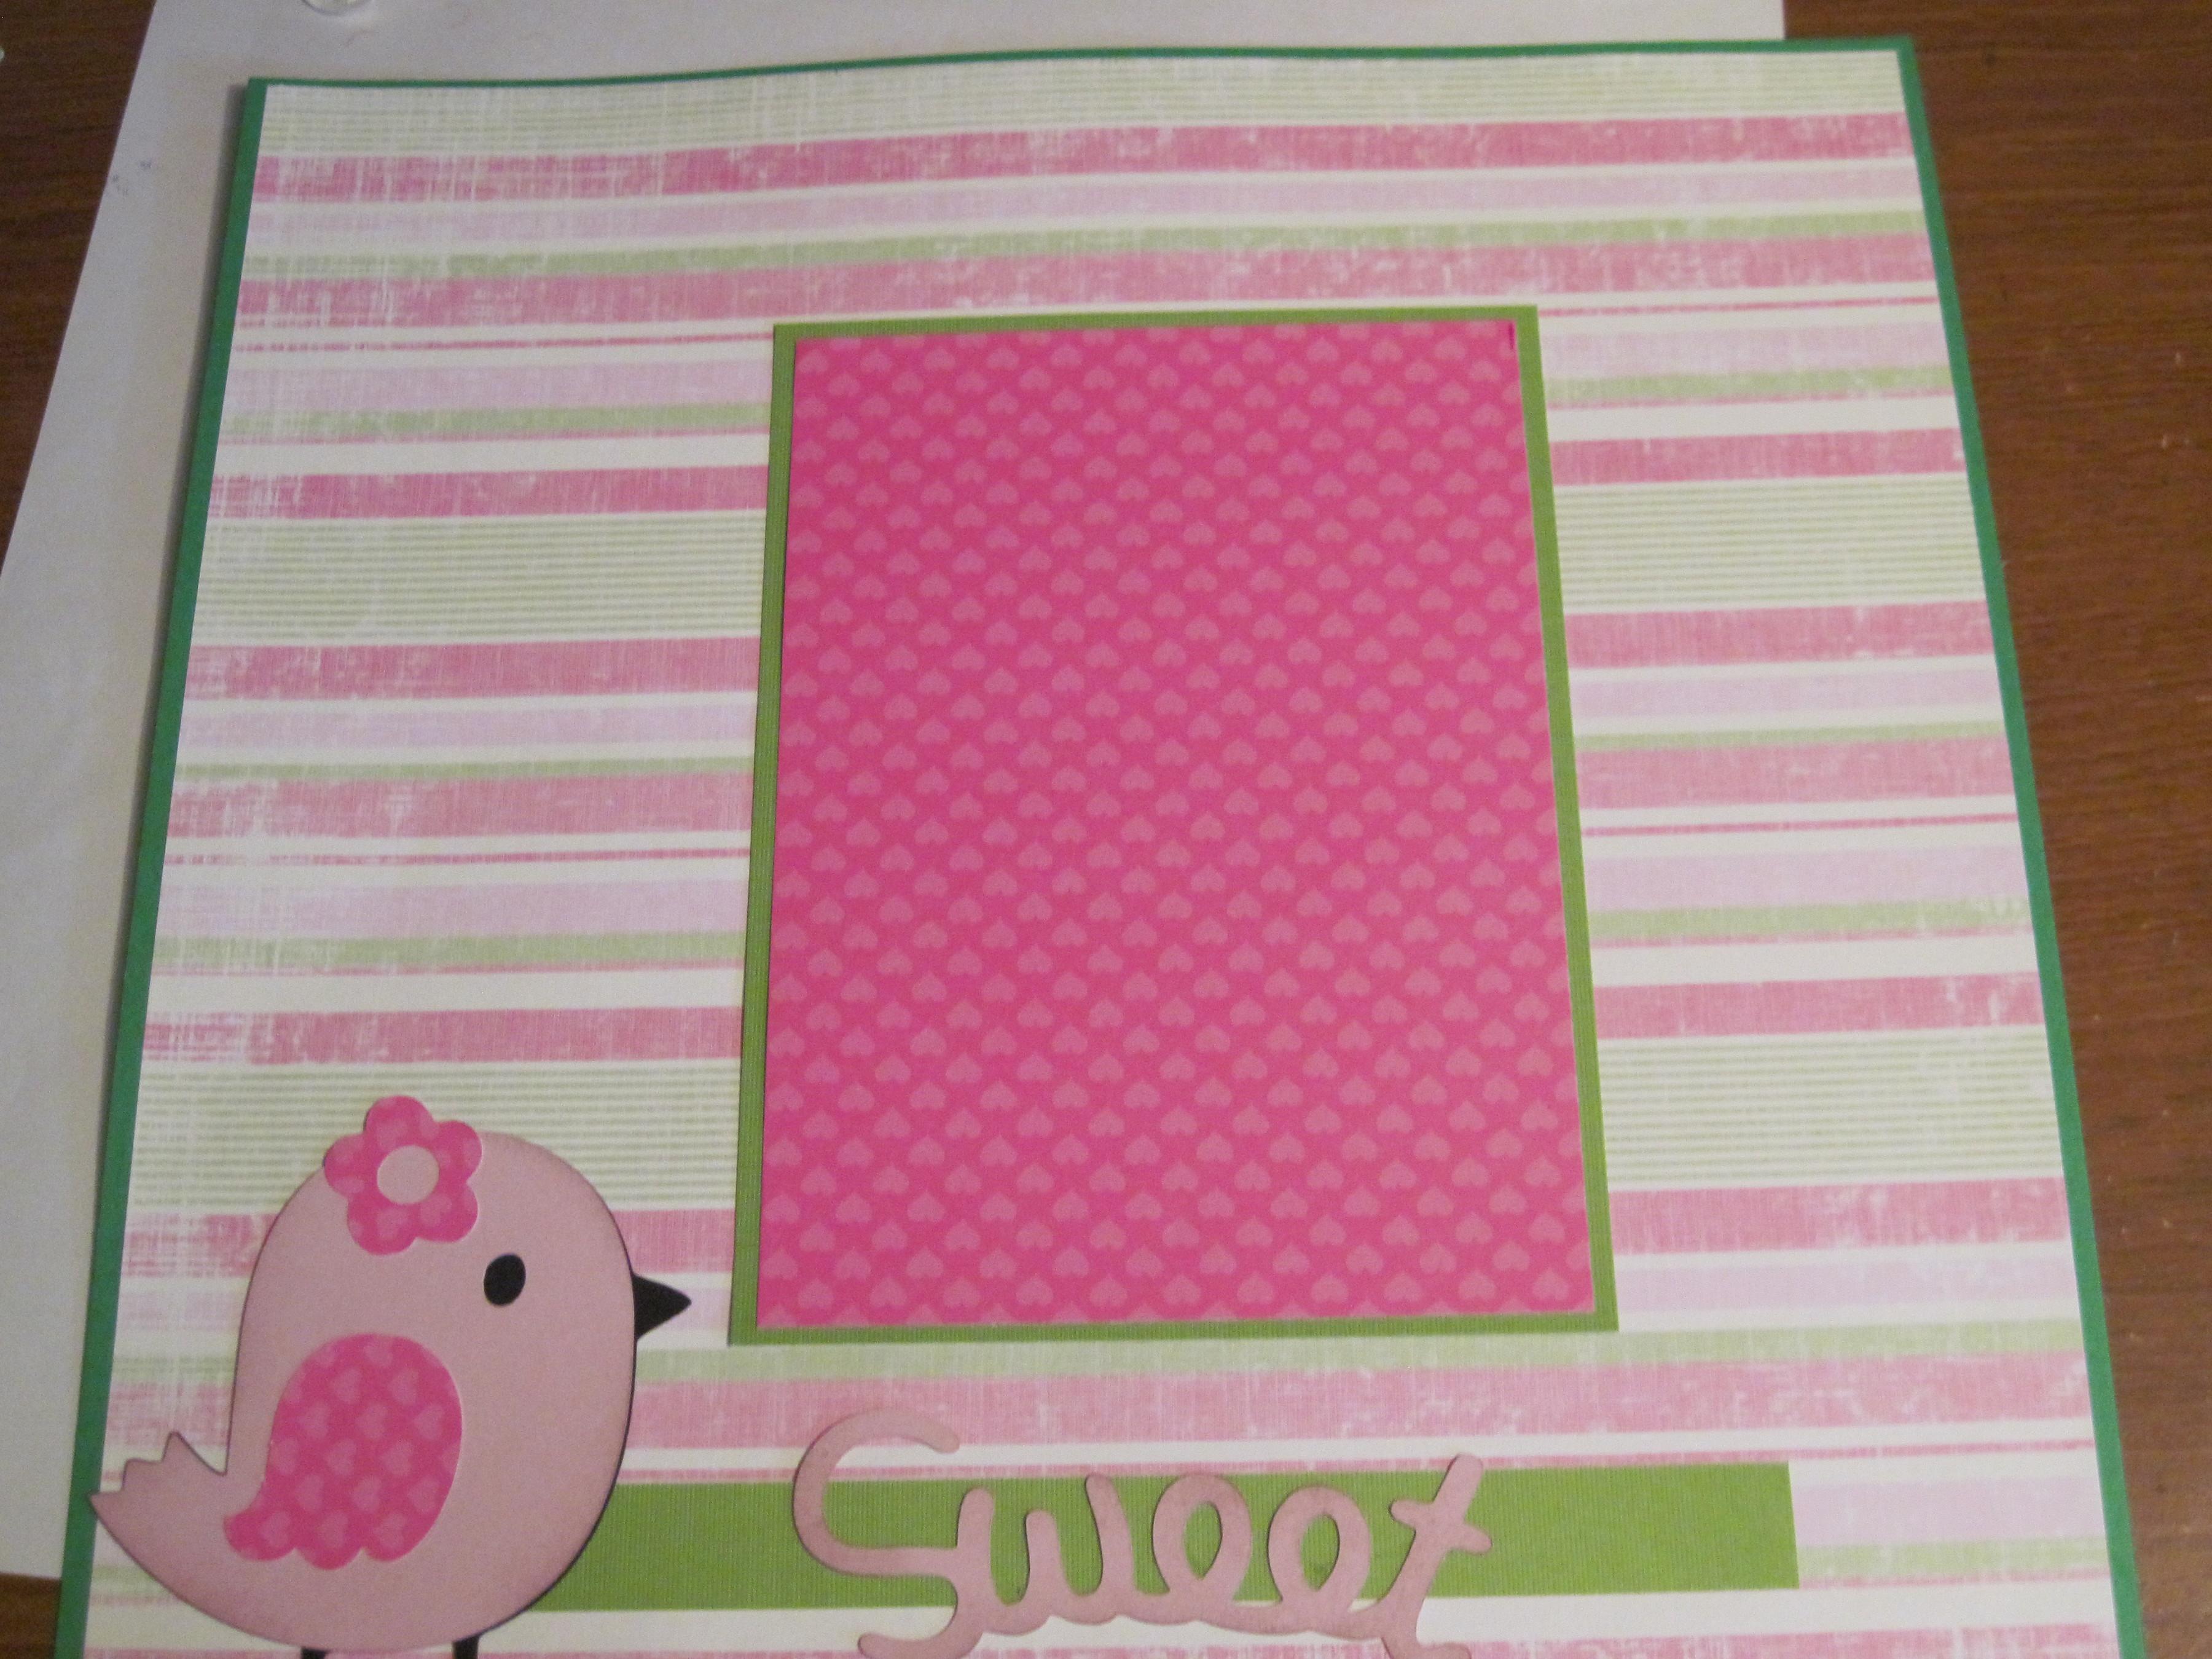 Scrapbook ideas using cricut - Scrapbook Layouts Using